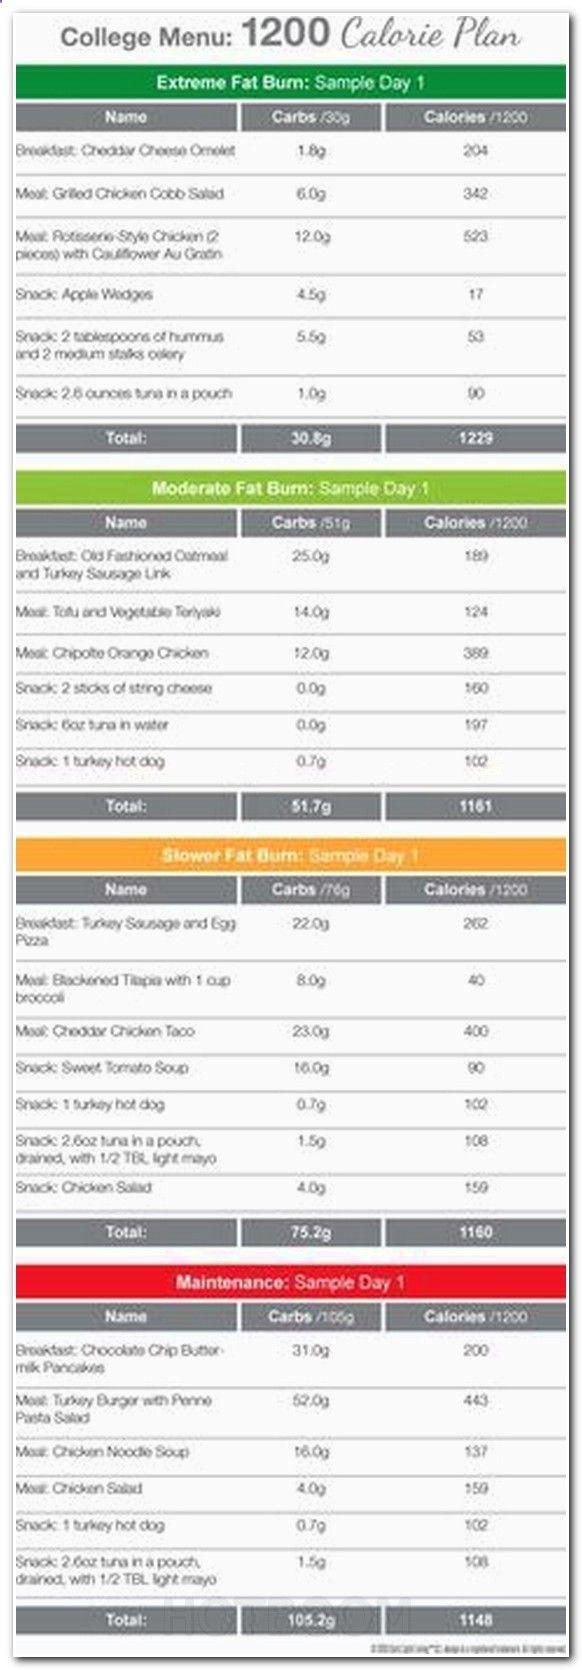 Tkd diet meal plan image 6